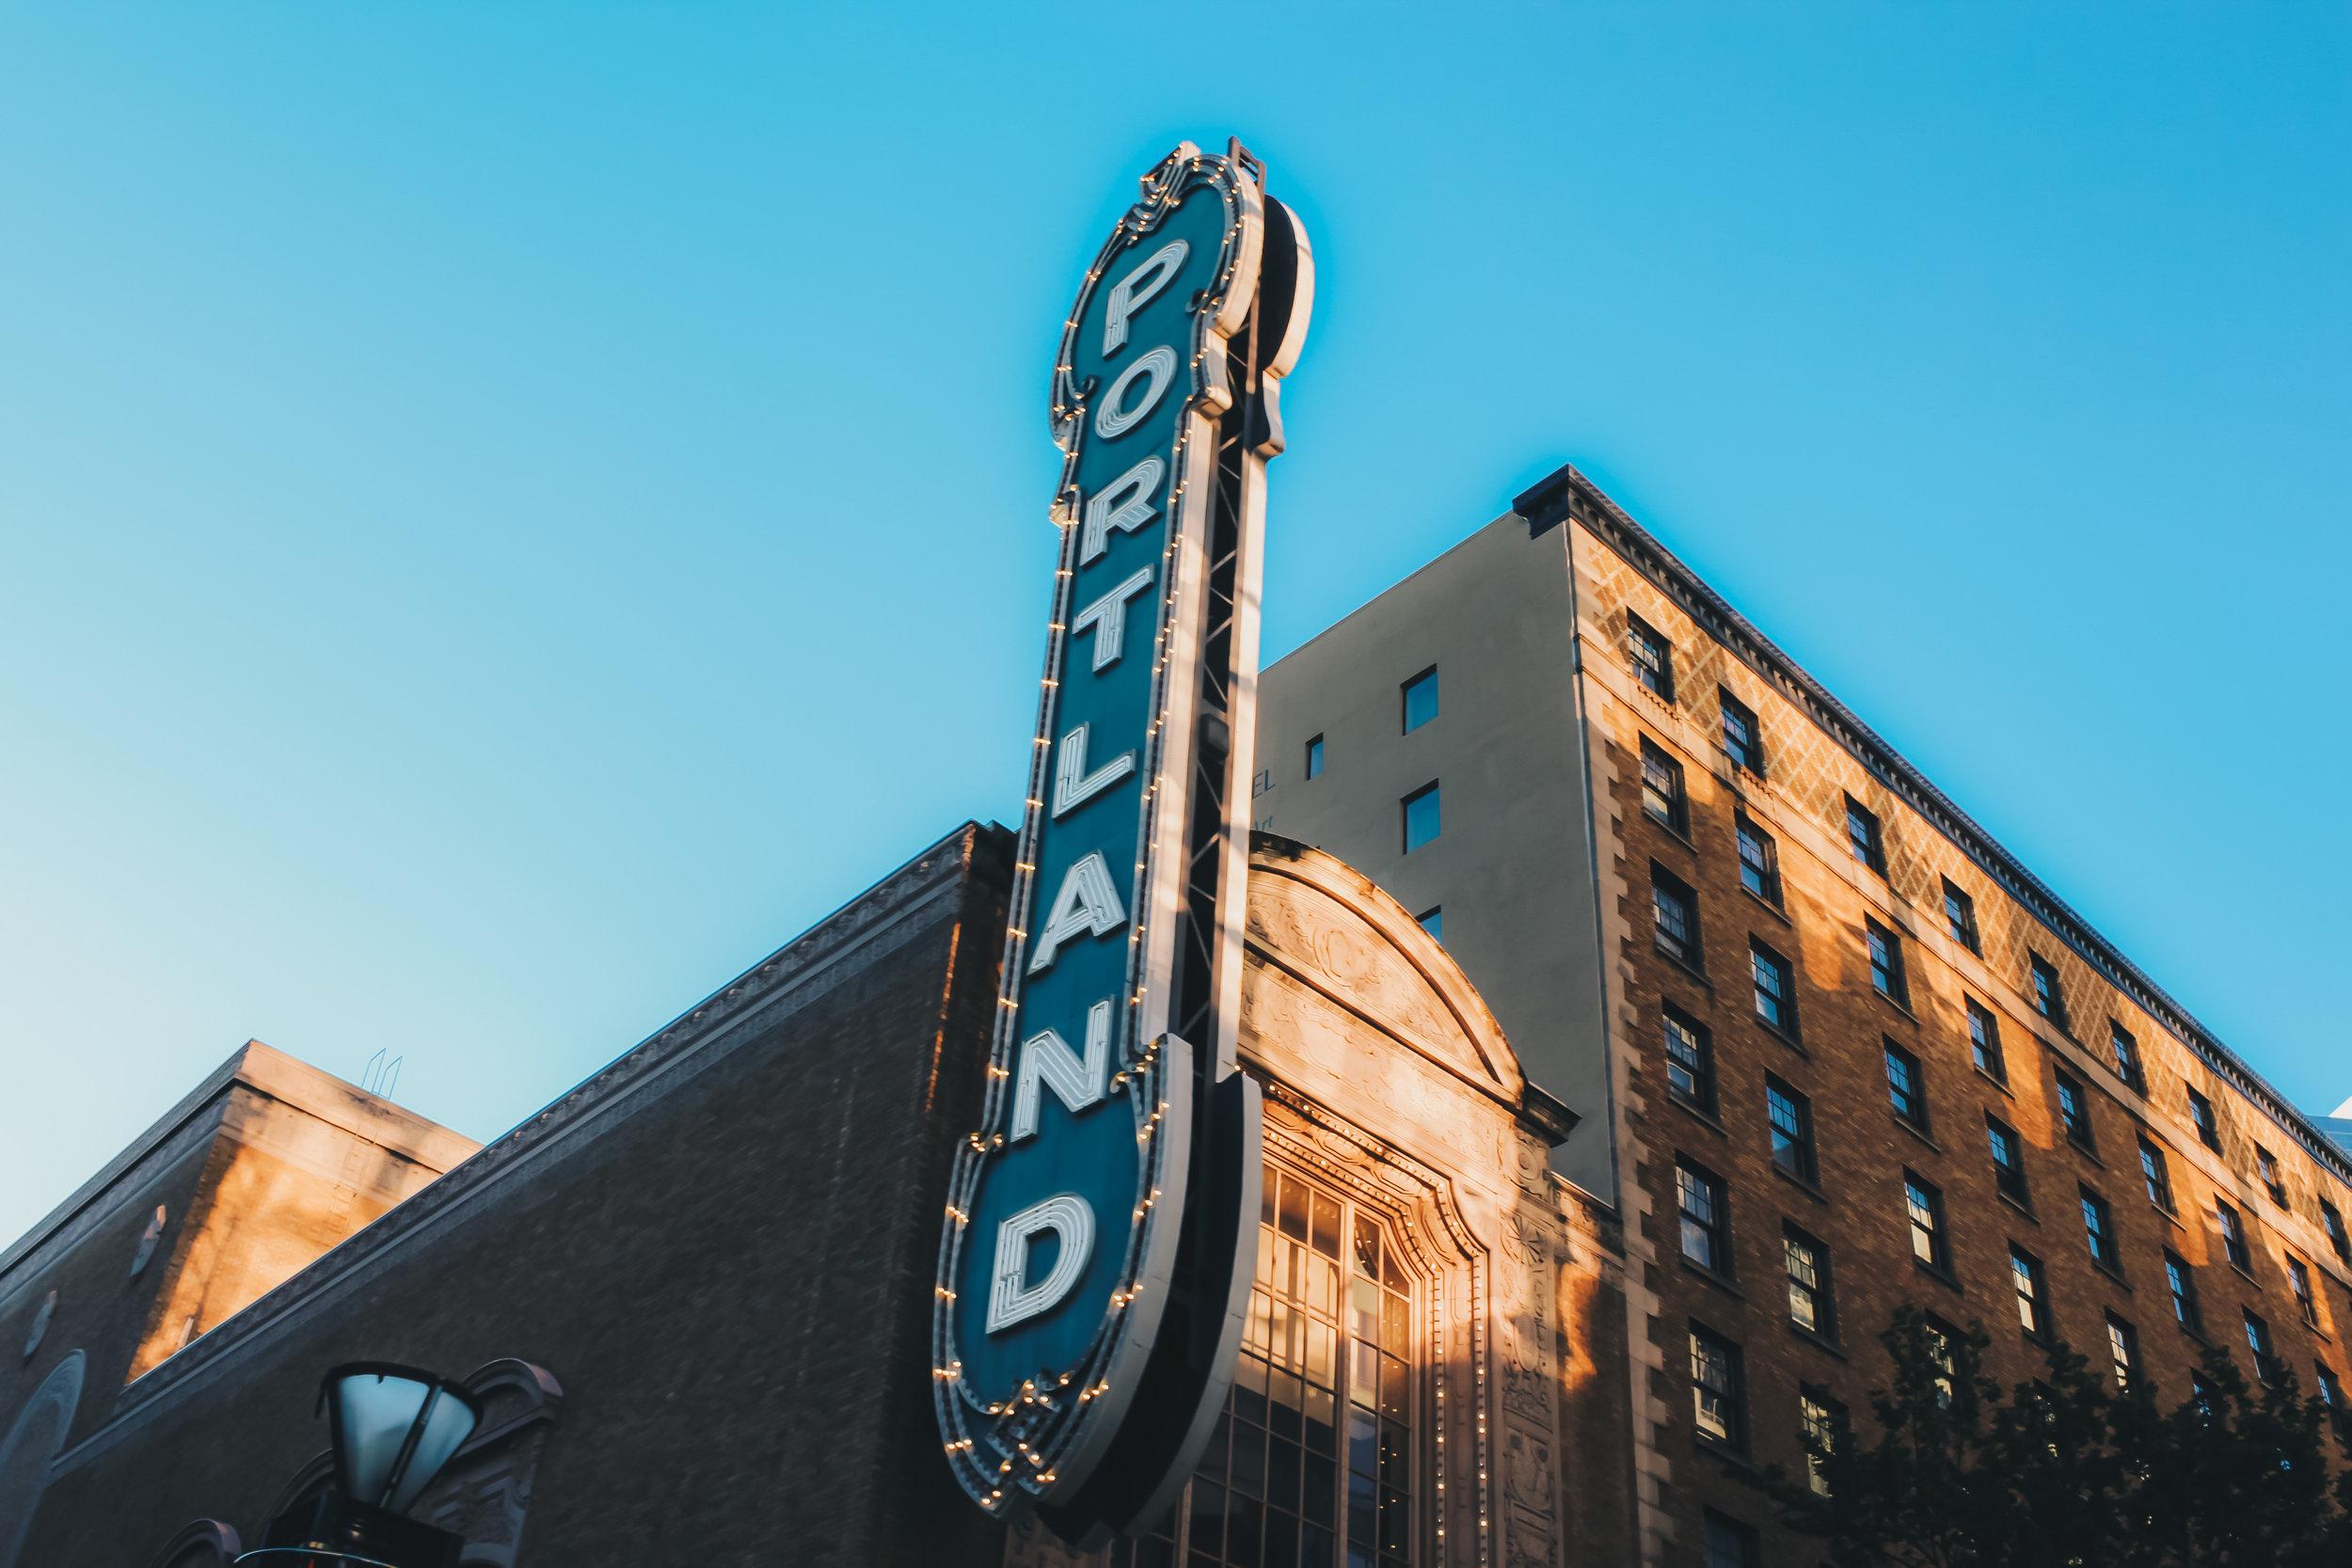 Portland, OR - LocationRiver Park Center2205 SE Spokane St. Suite 300, Portland, OR 97202